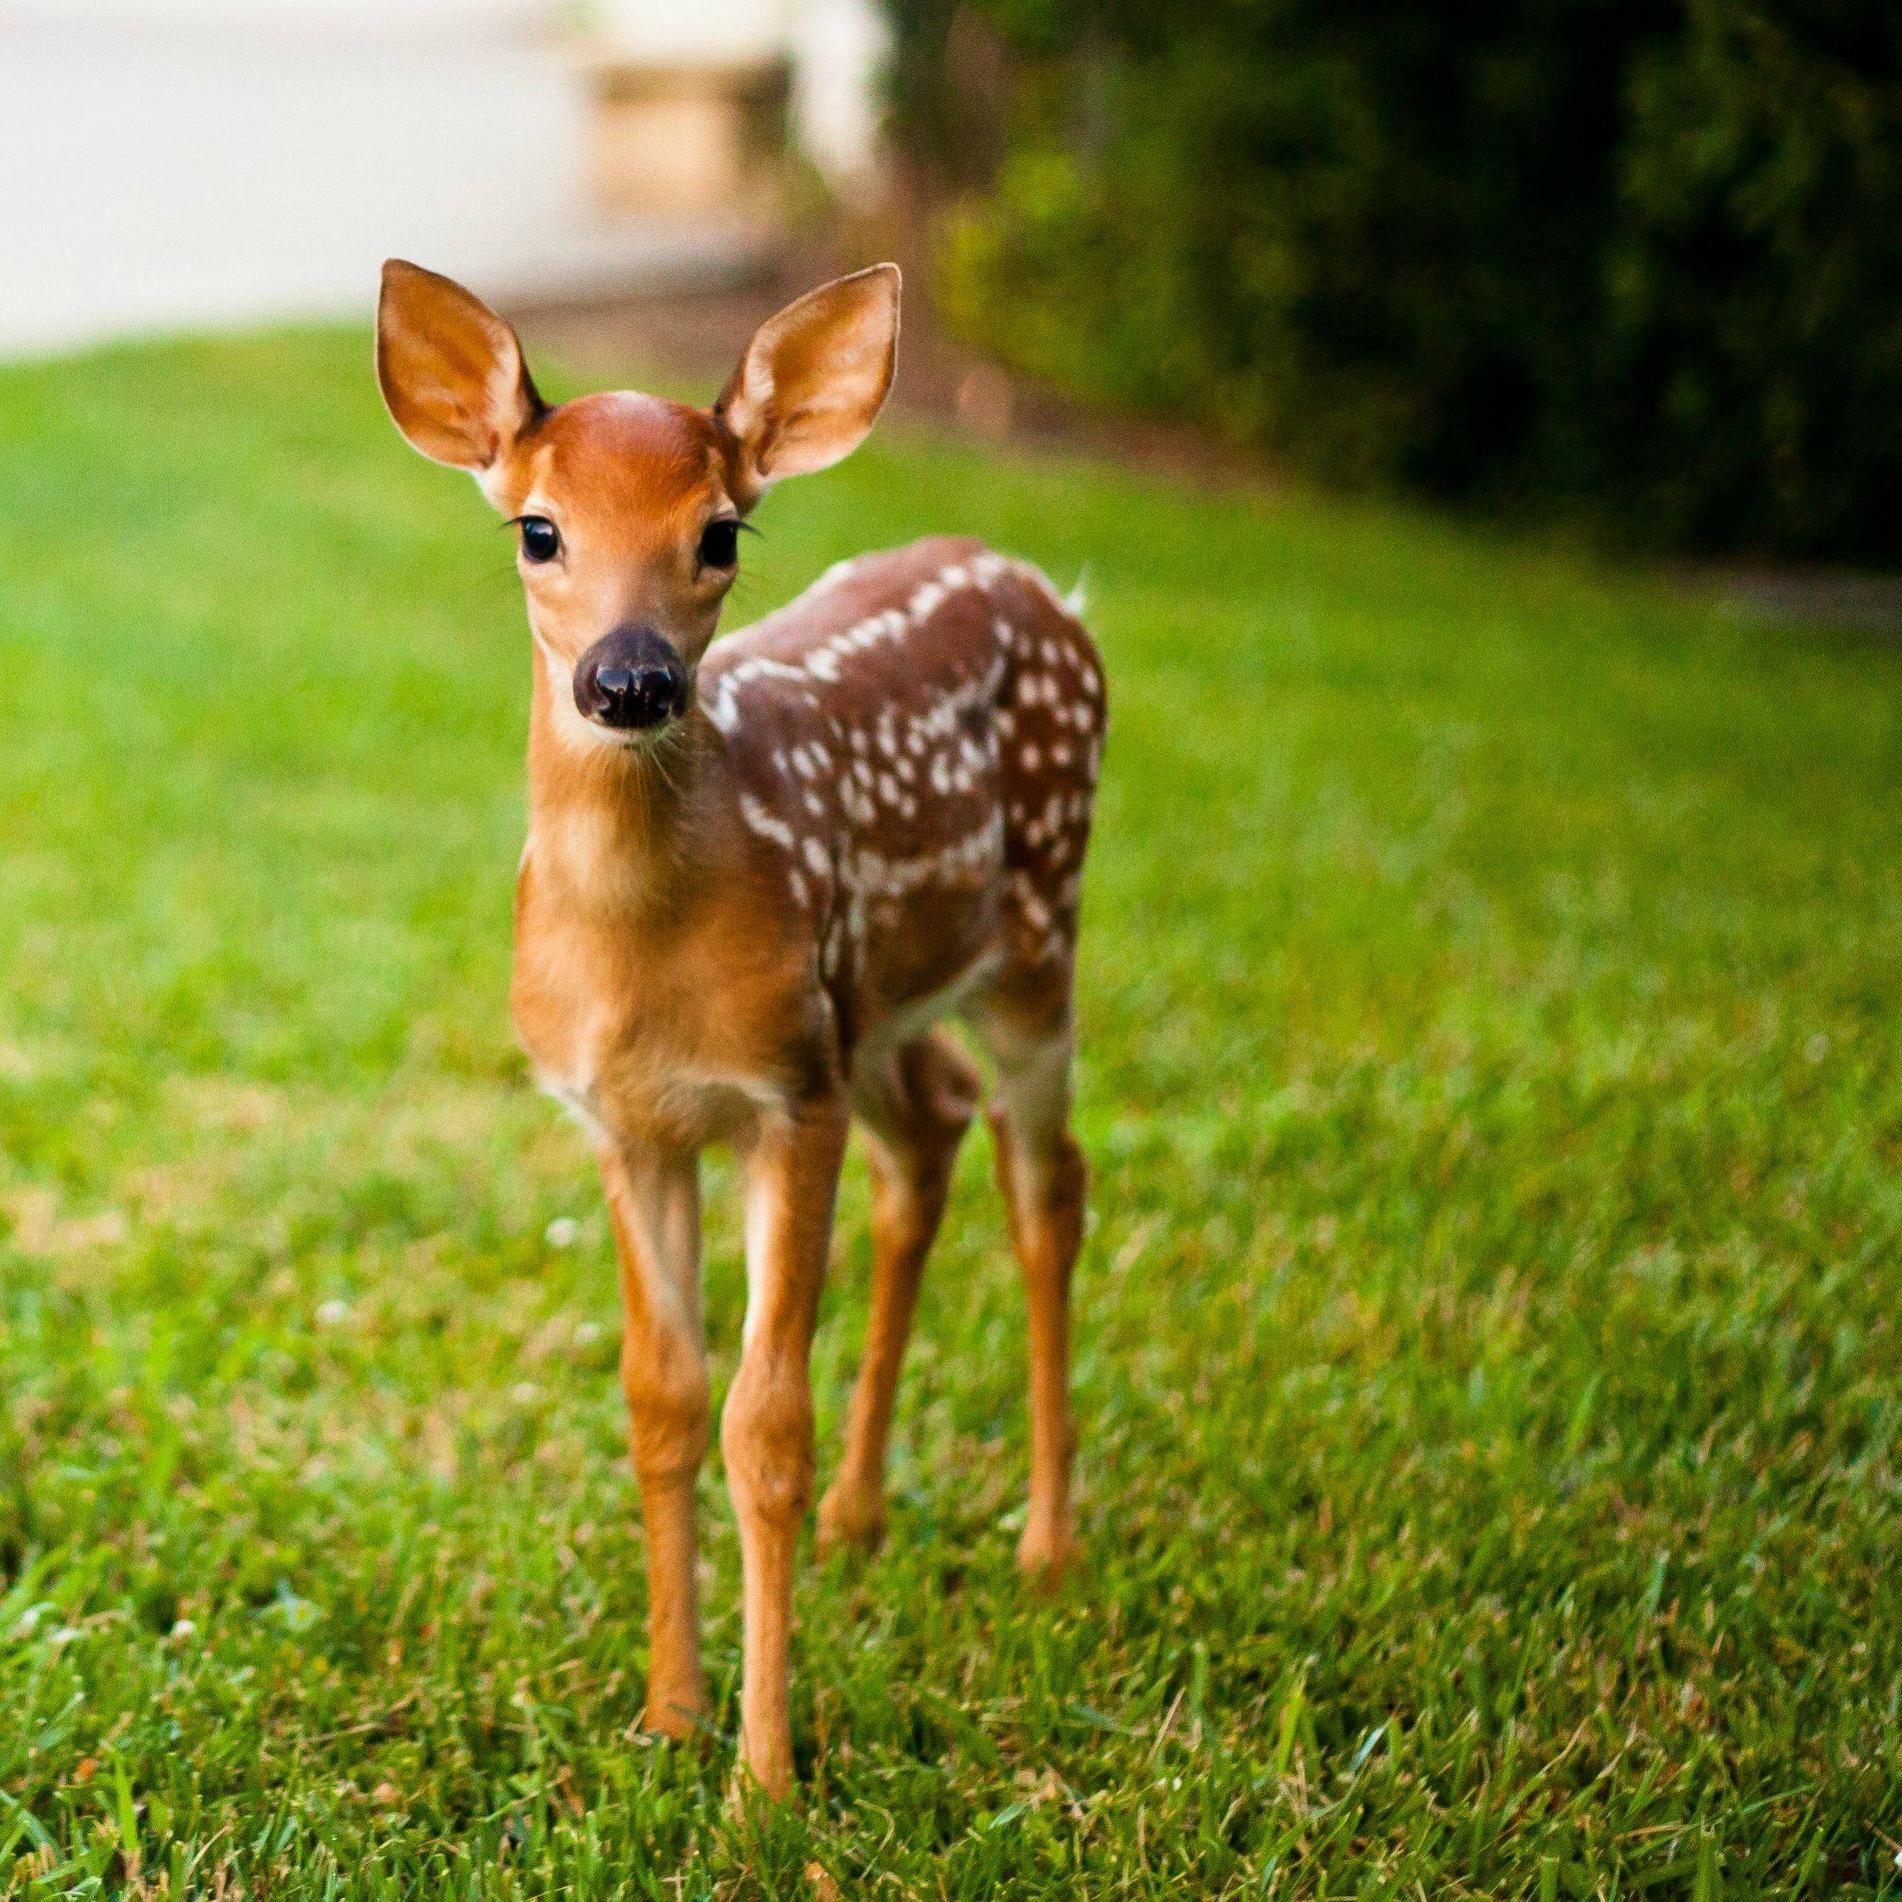 Animal Baby Deer Fawn